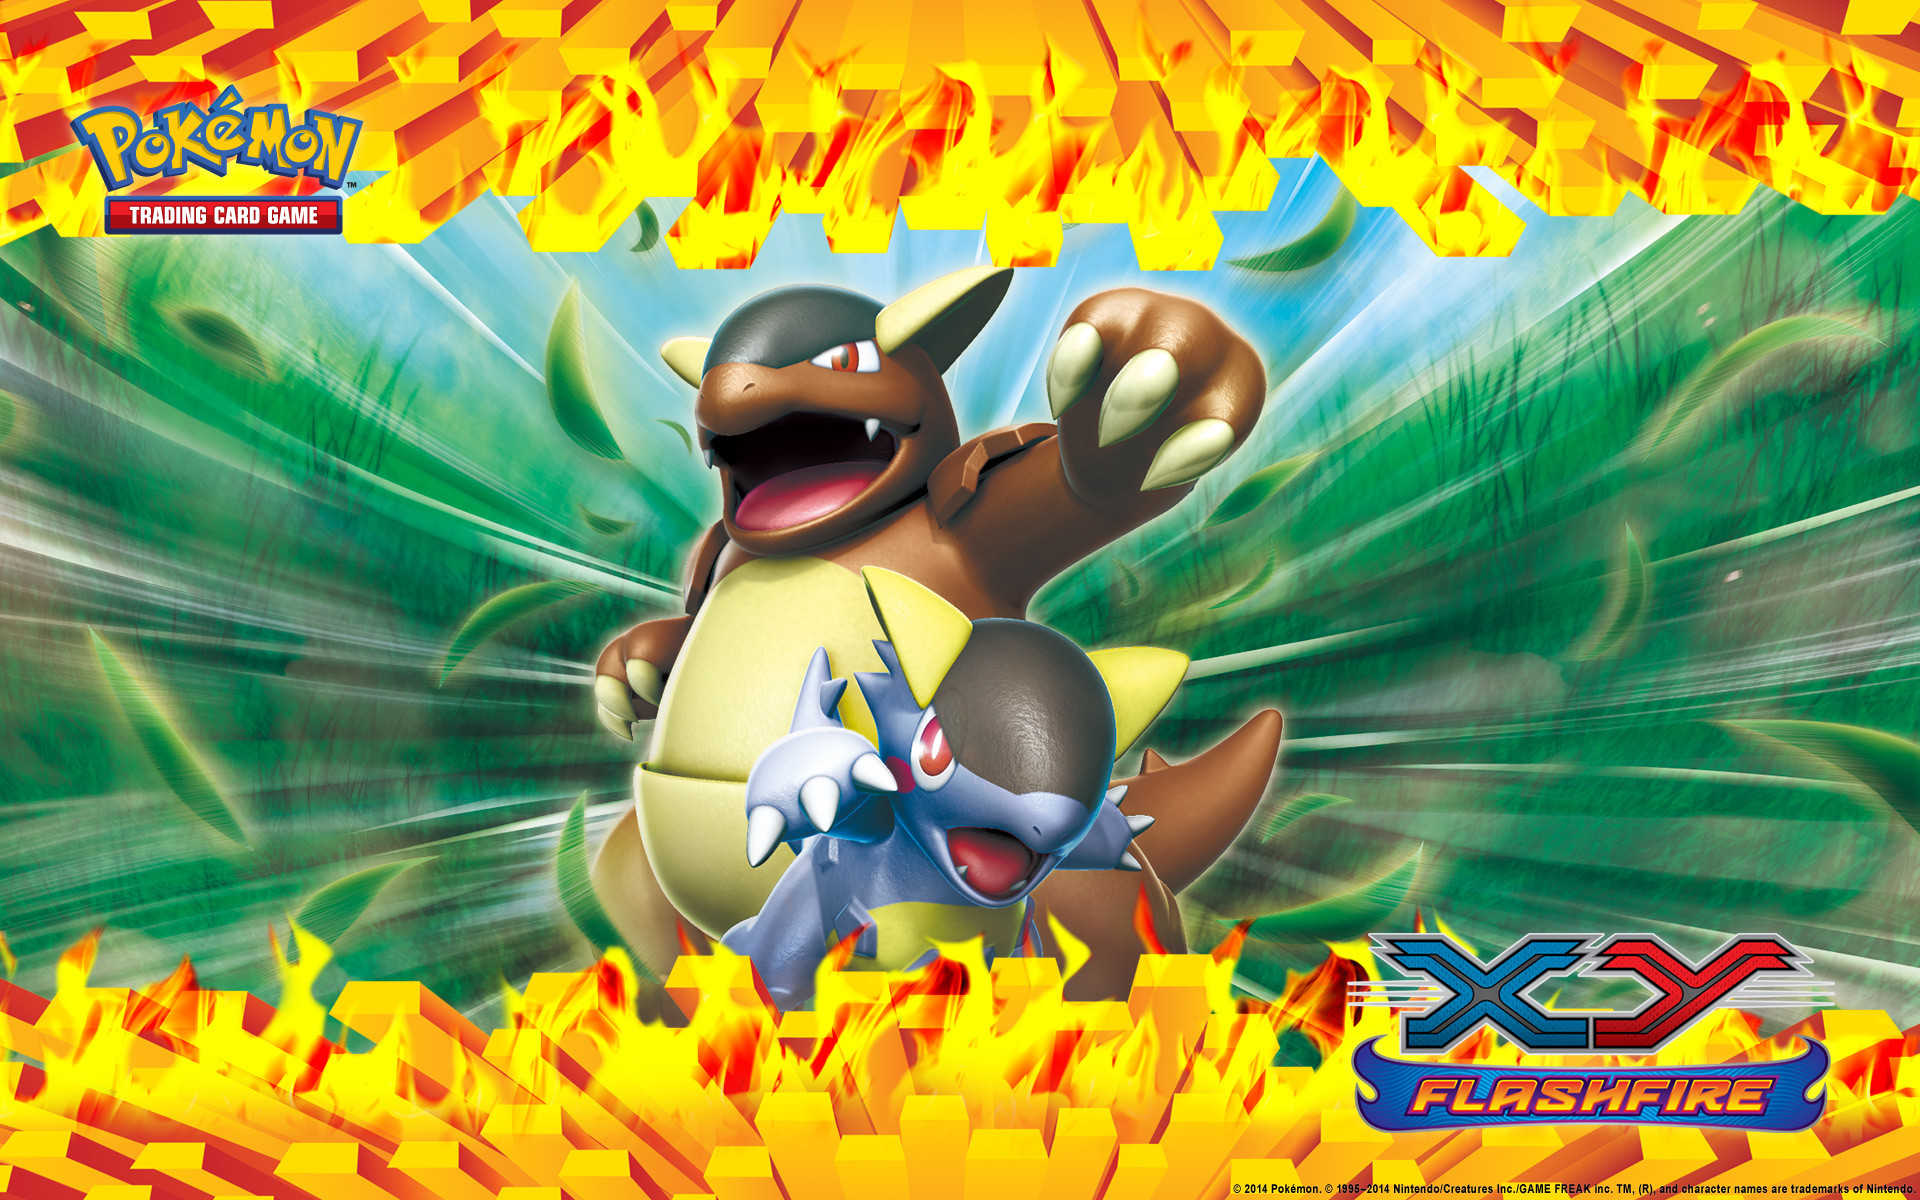 Pokémon TCG: XY—Flashfire Kangaskhan Wallpaper